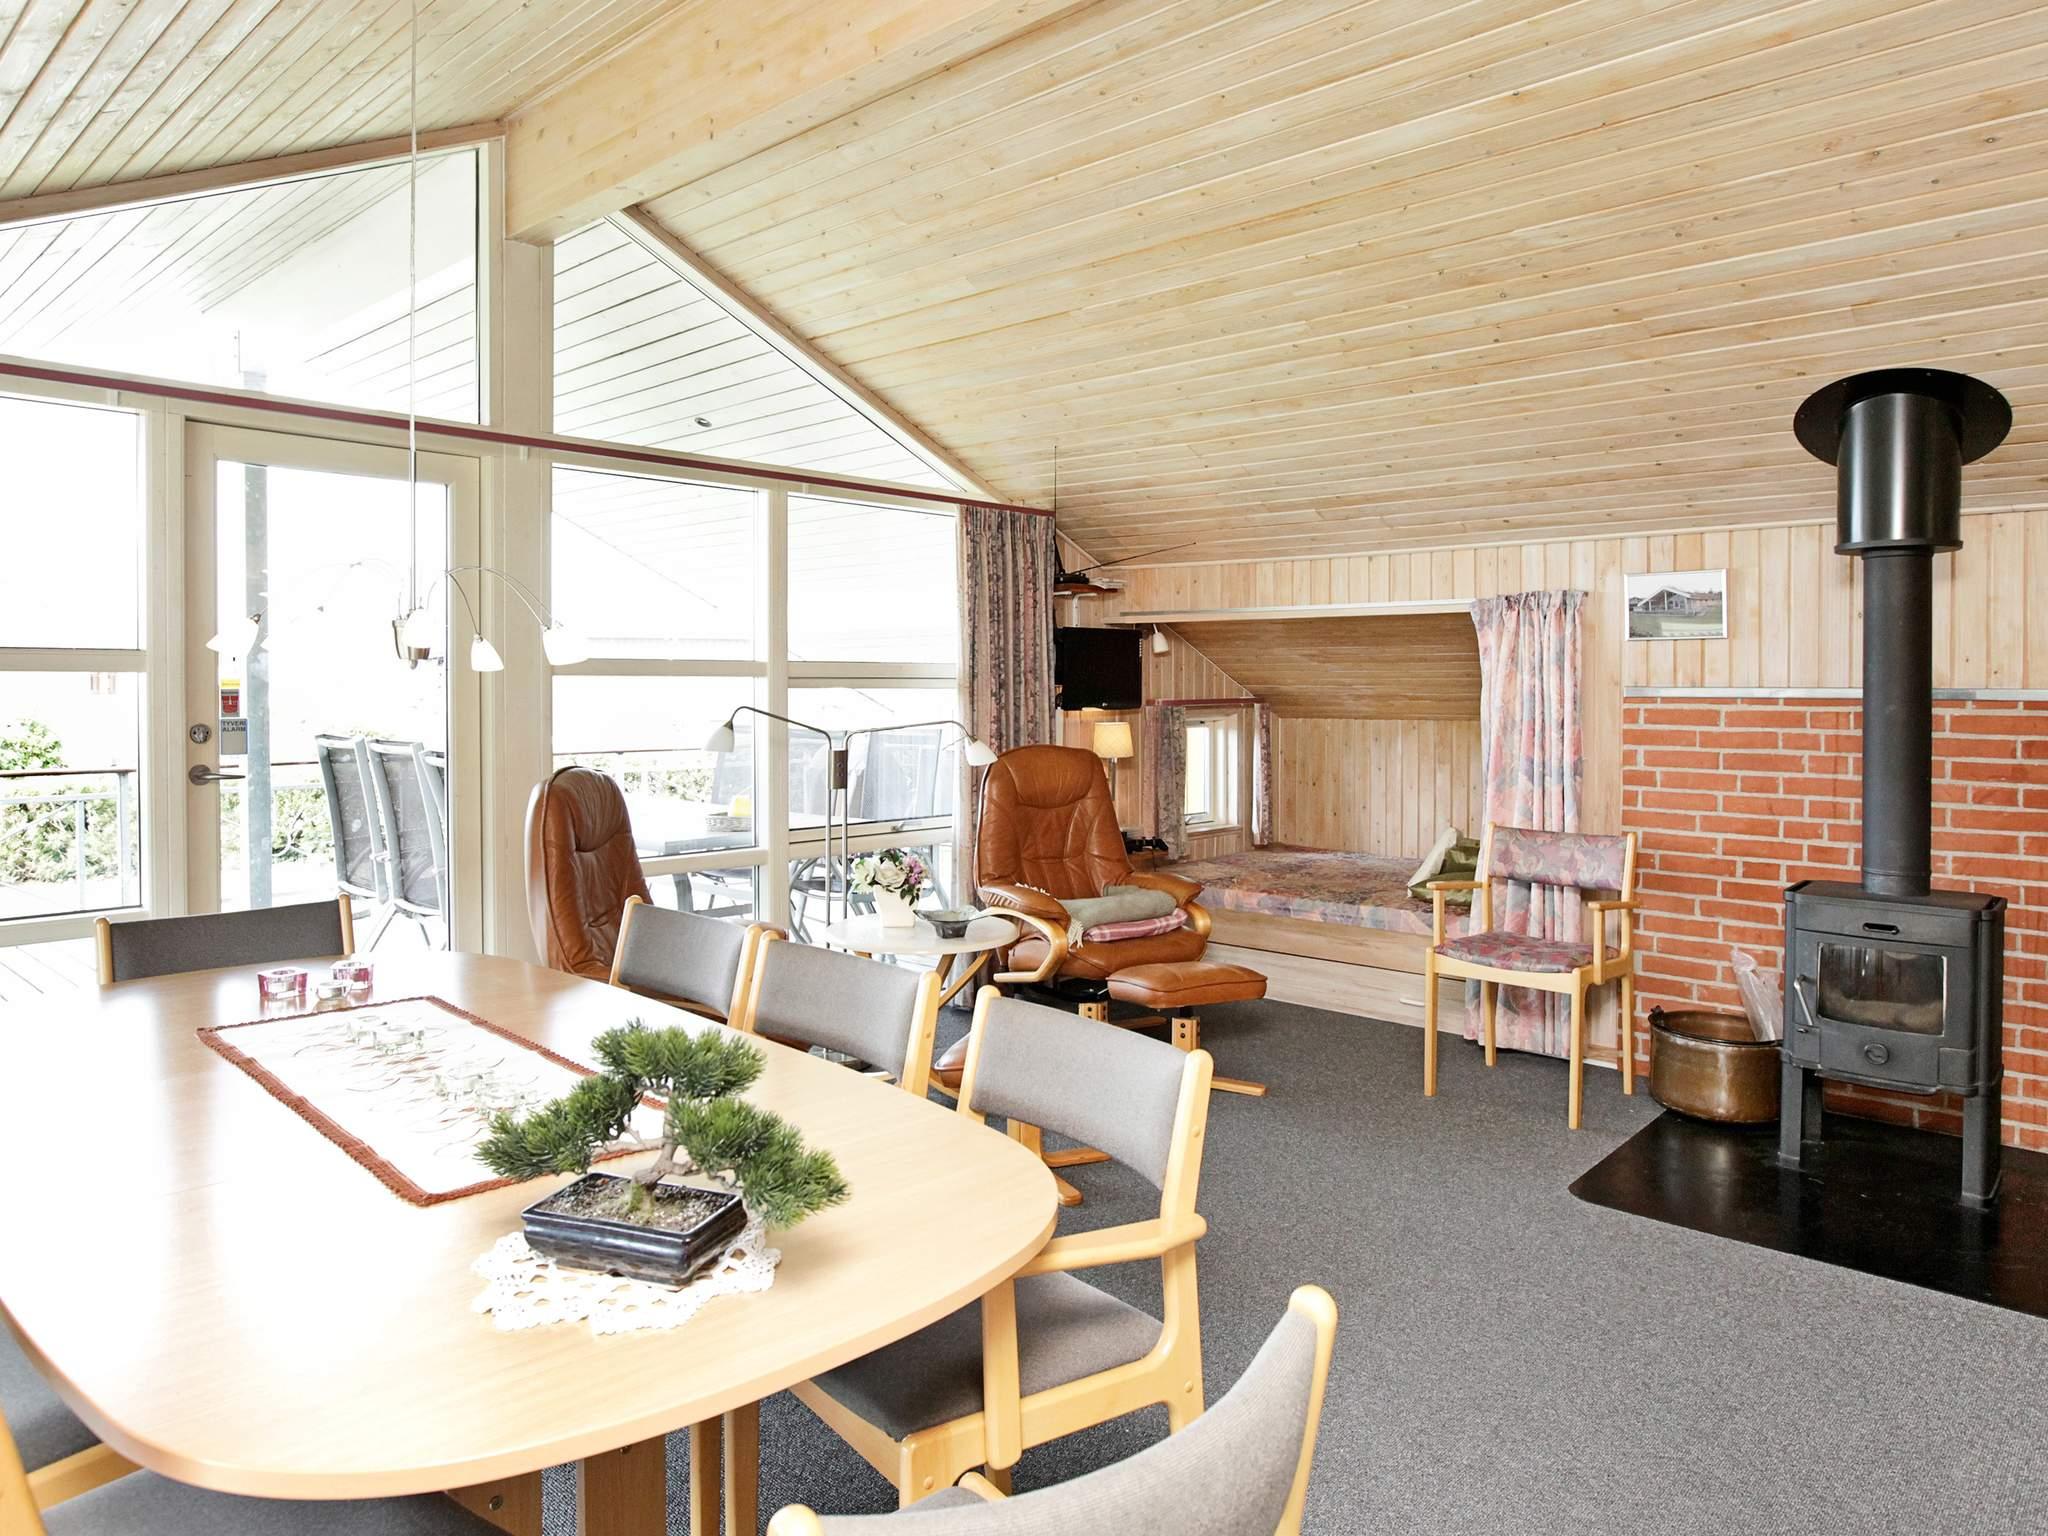 Maison de vacances Falsled (87545), Faldsled, , Fionie, Danemark, image 2